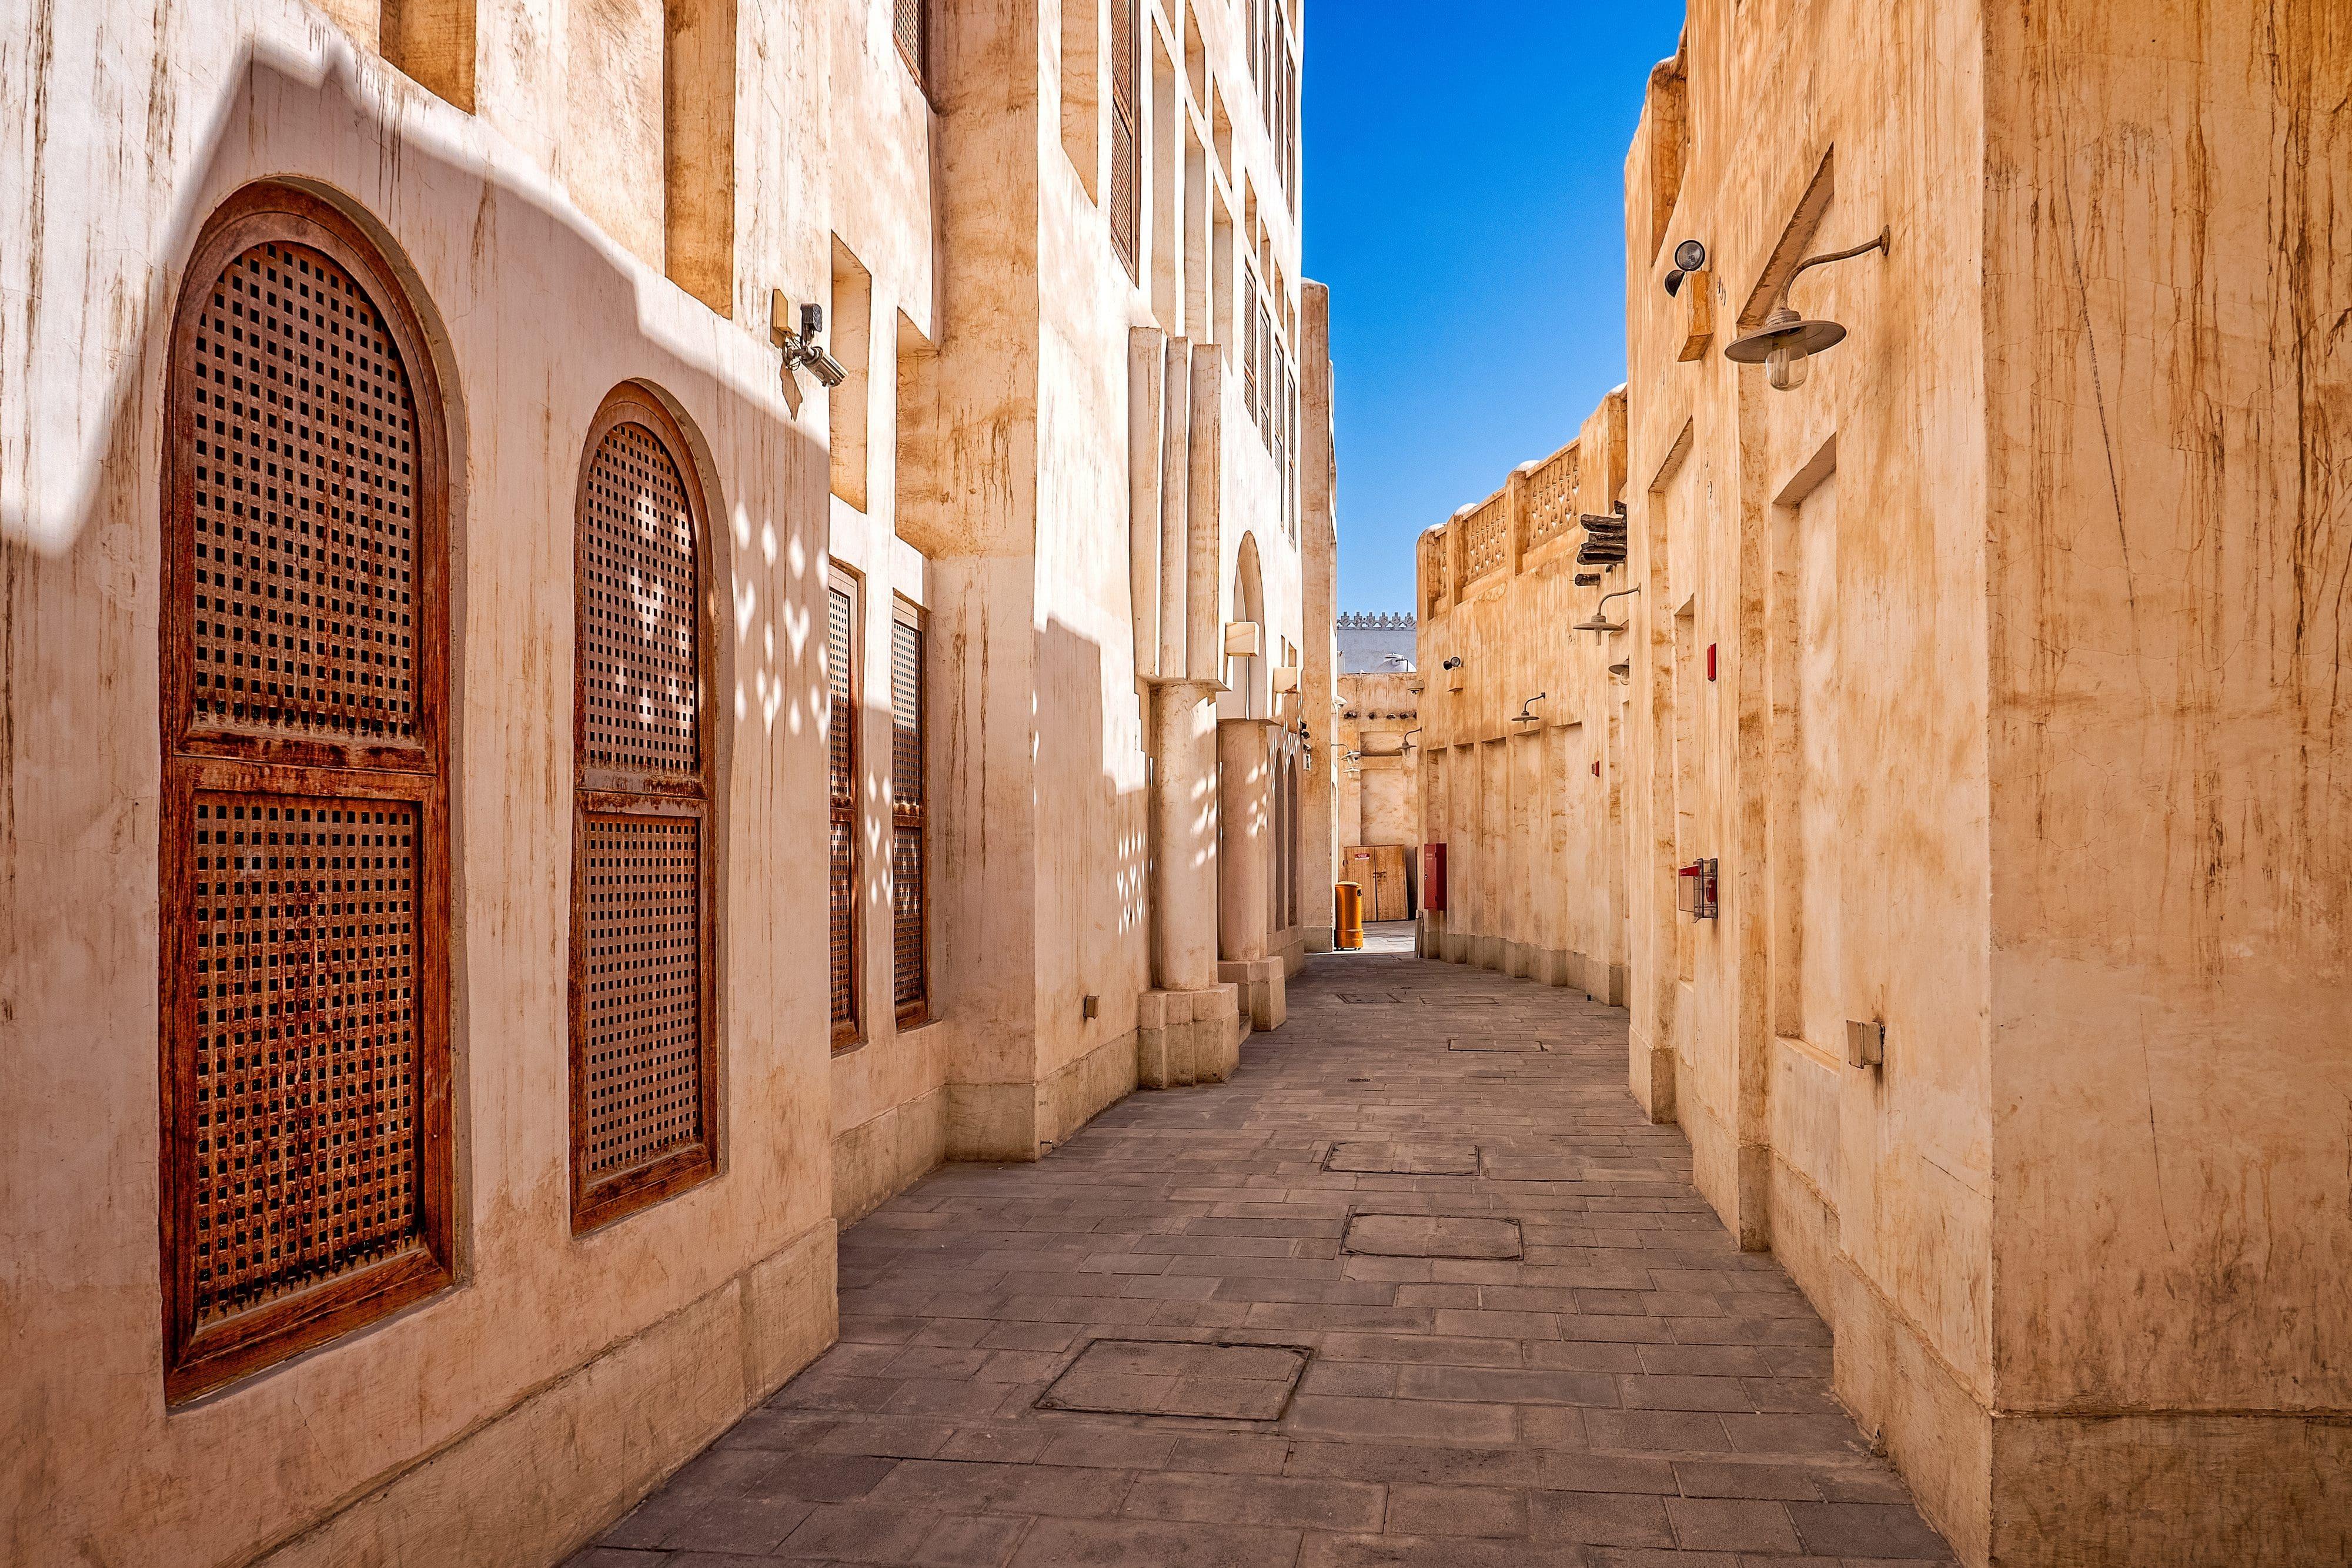 The narrow lanes of Souq Waqif